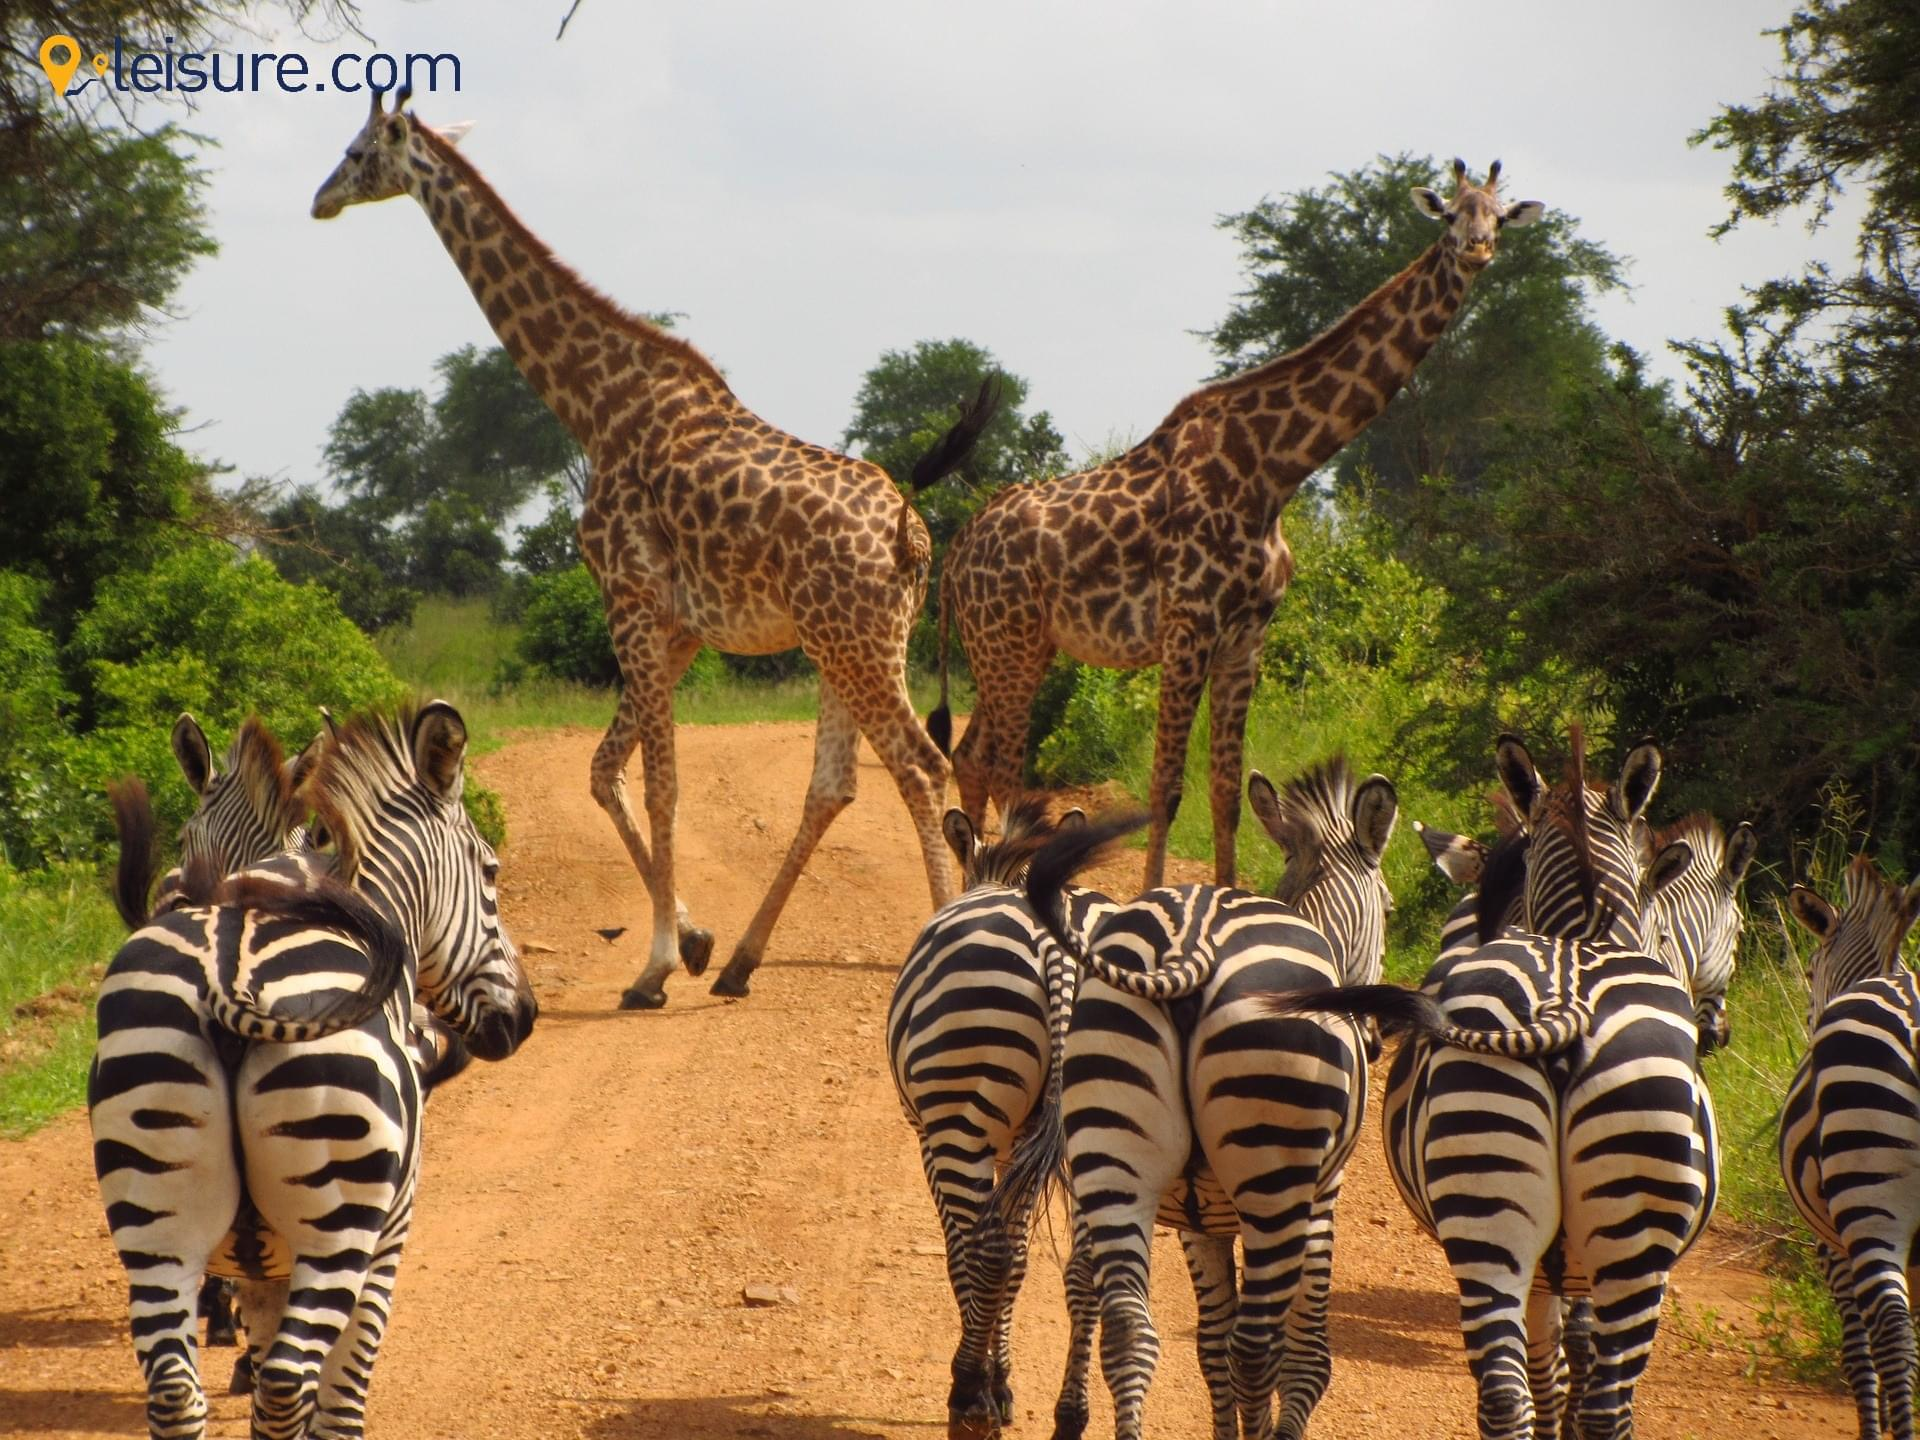 My trip to Tanzania still gives me goosebumps